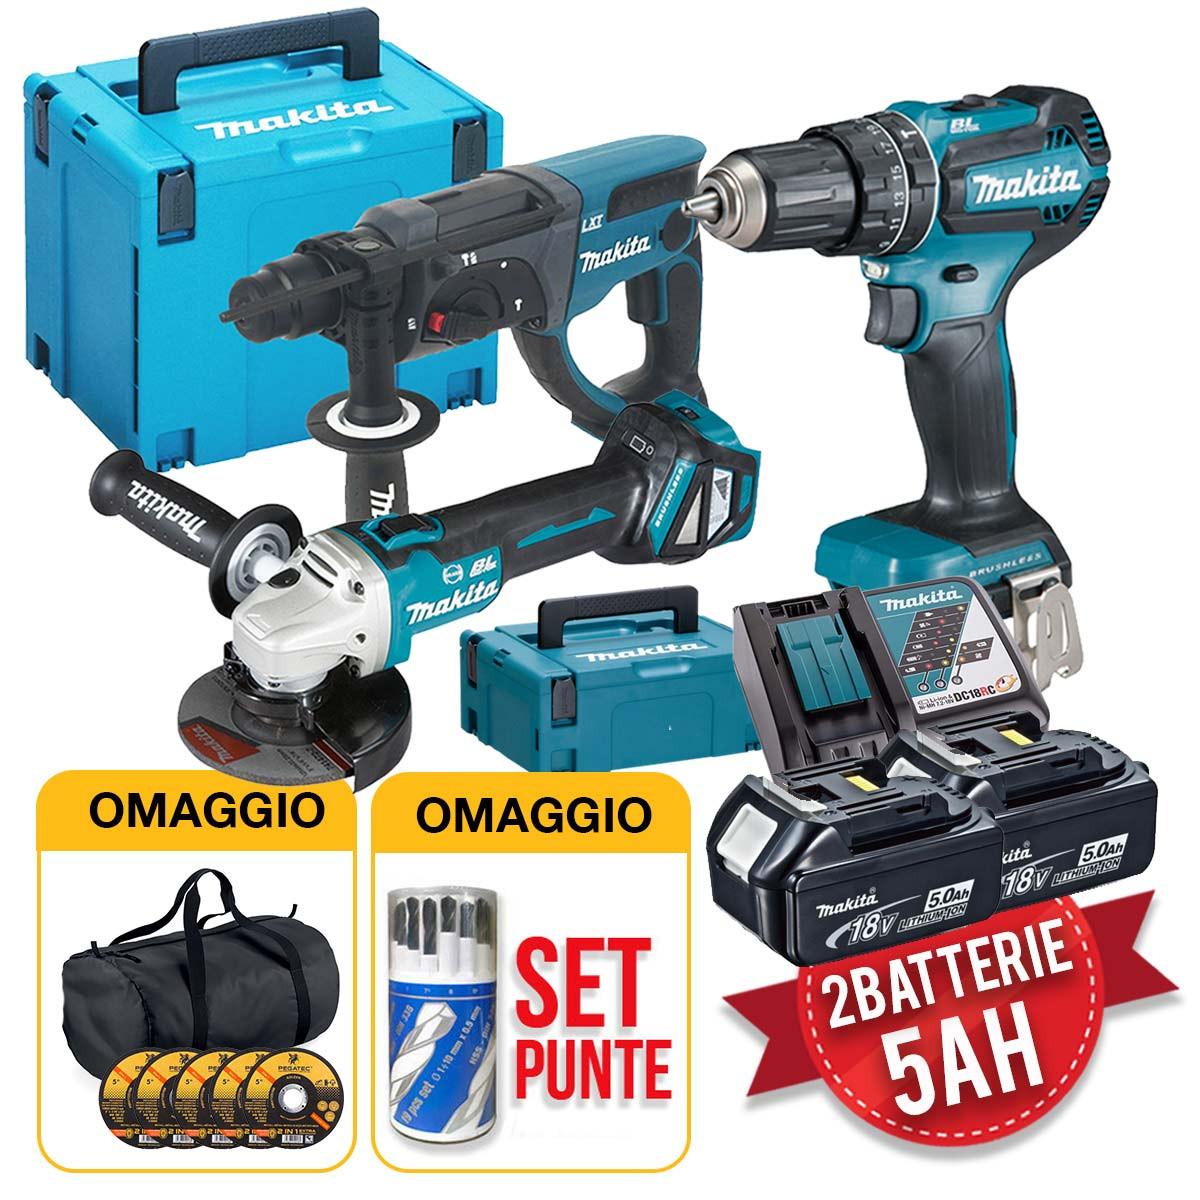 Makita kit utensili 18V - Trapano, Smerigliatrice, Tassellatore, 2 batterie 5Ah